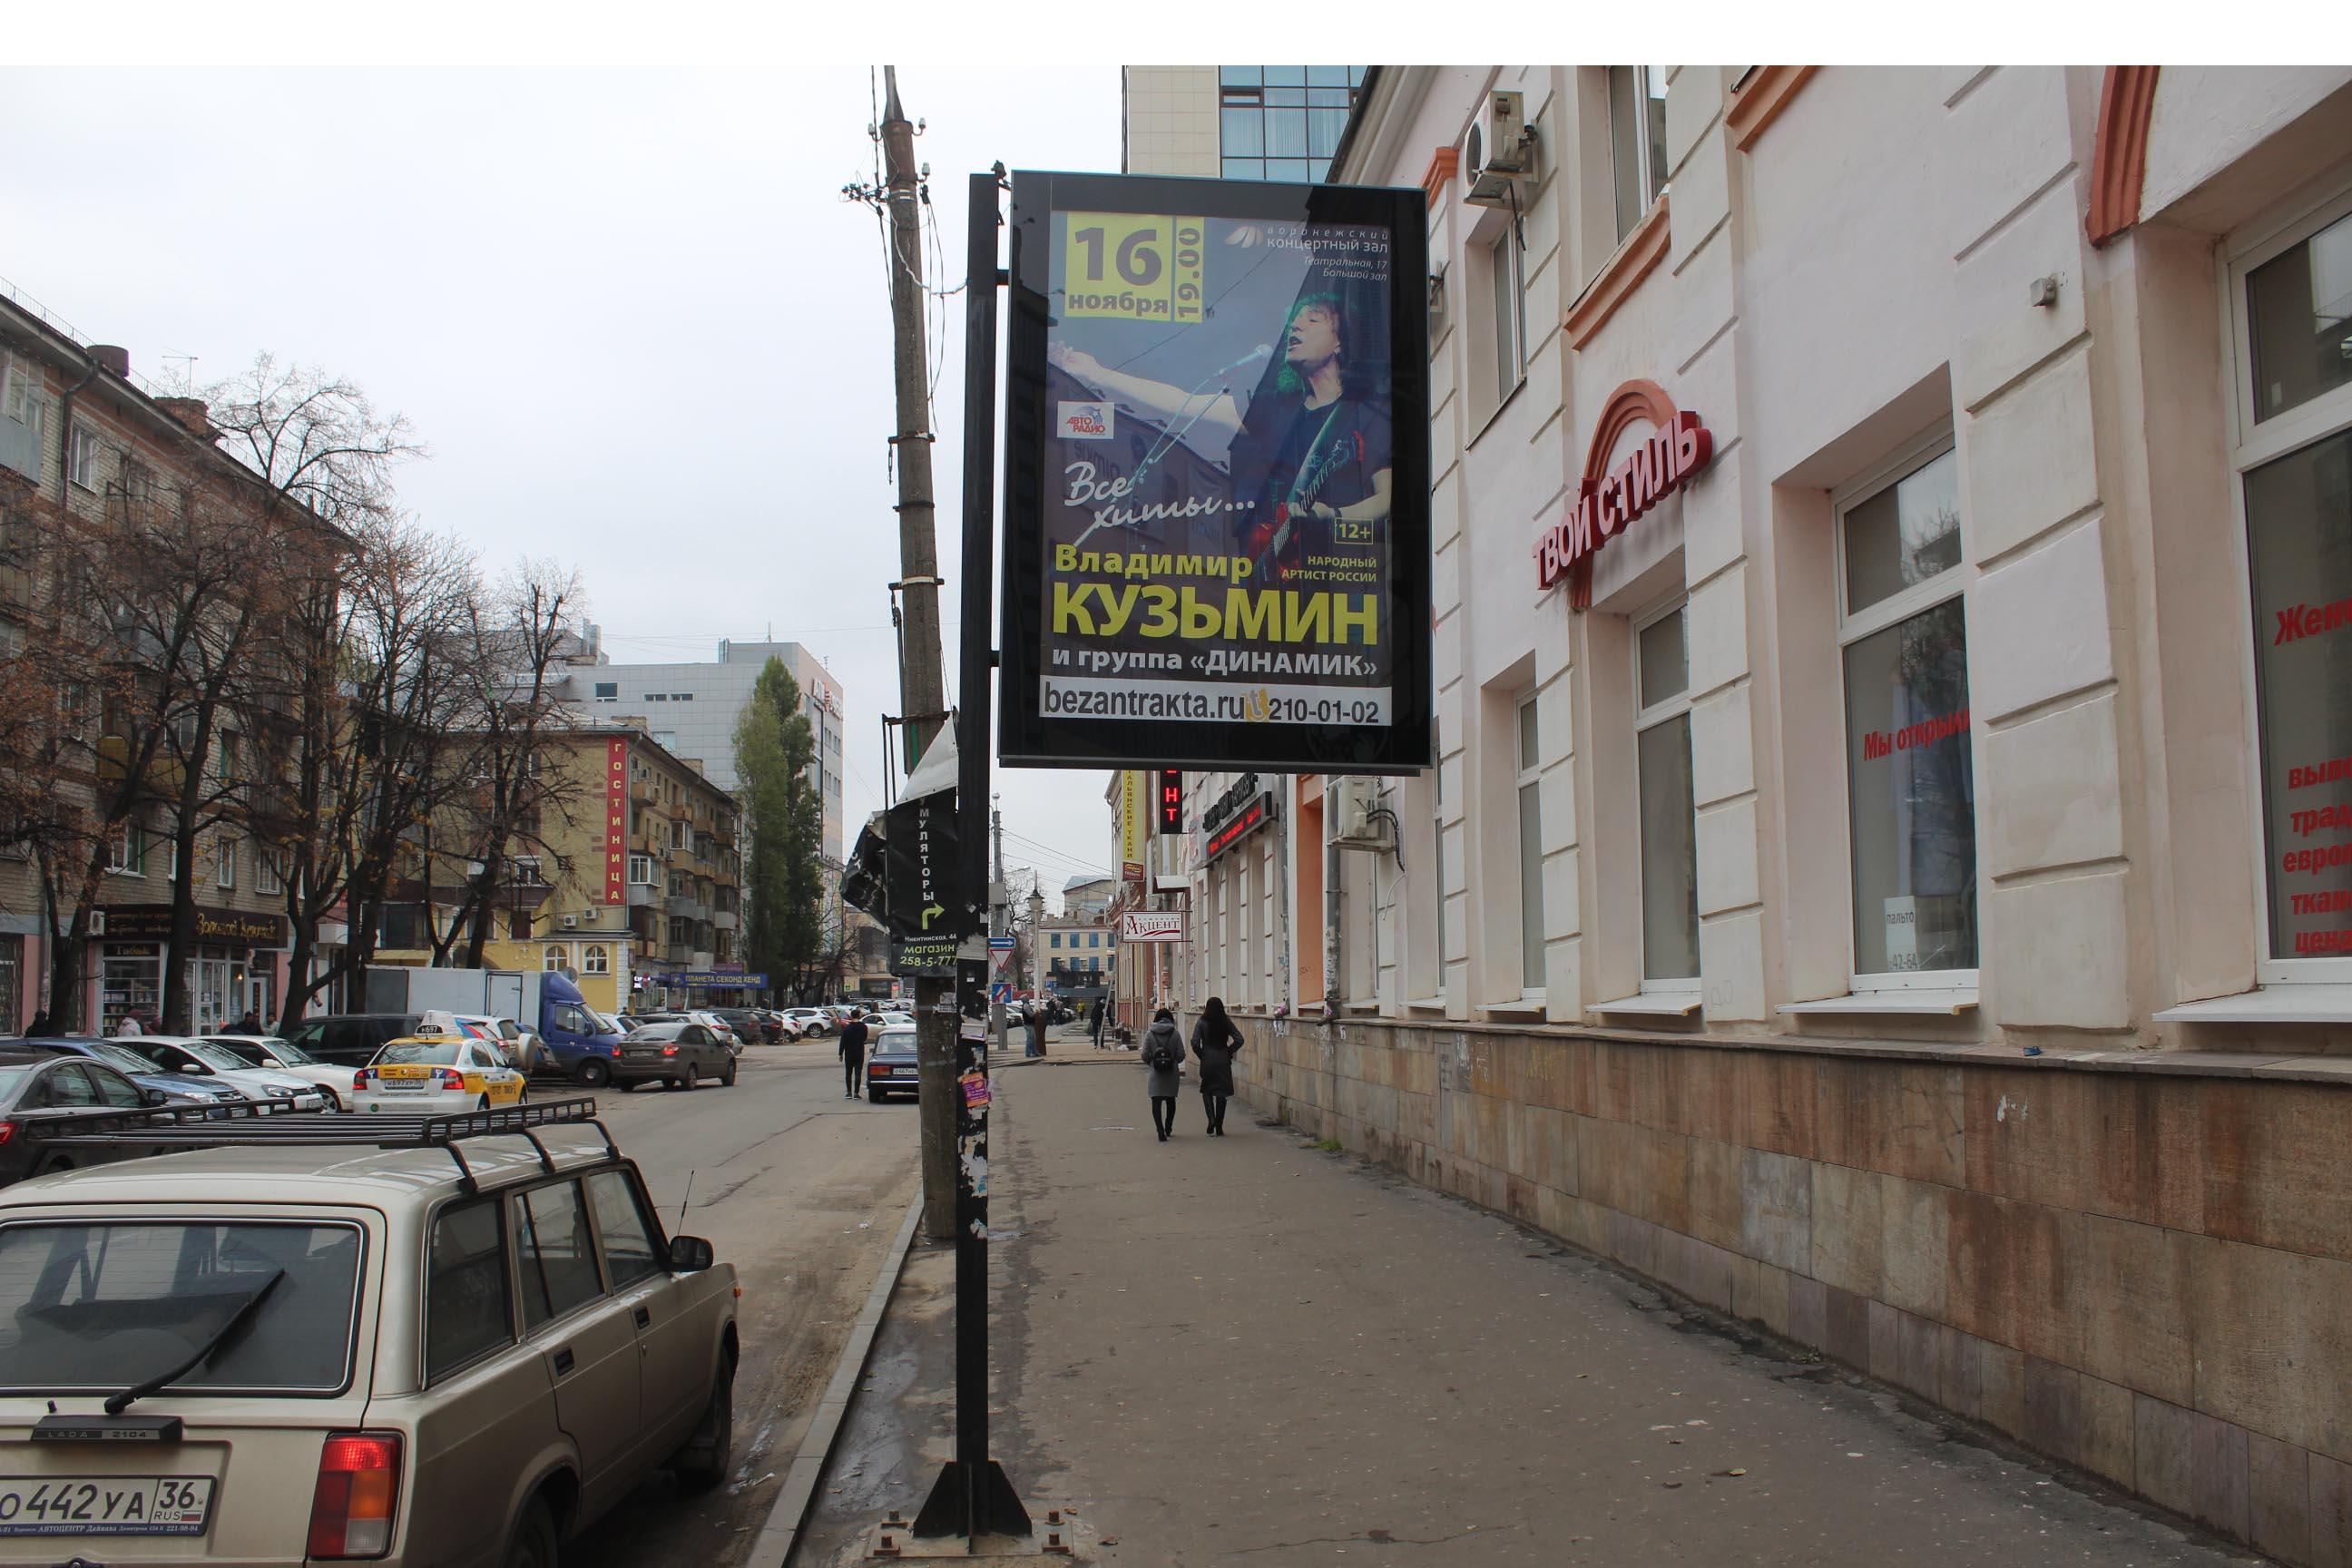 212А ул.Куколкина-ул.Никитинская, 42 ХОРЕКА